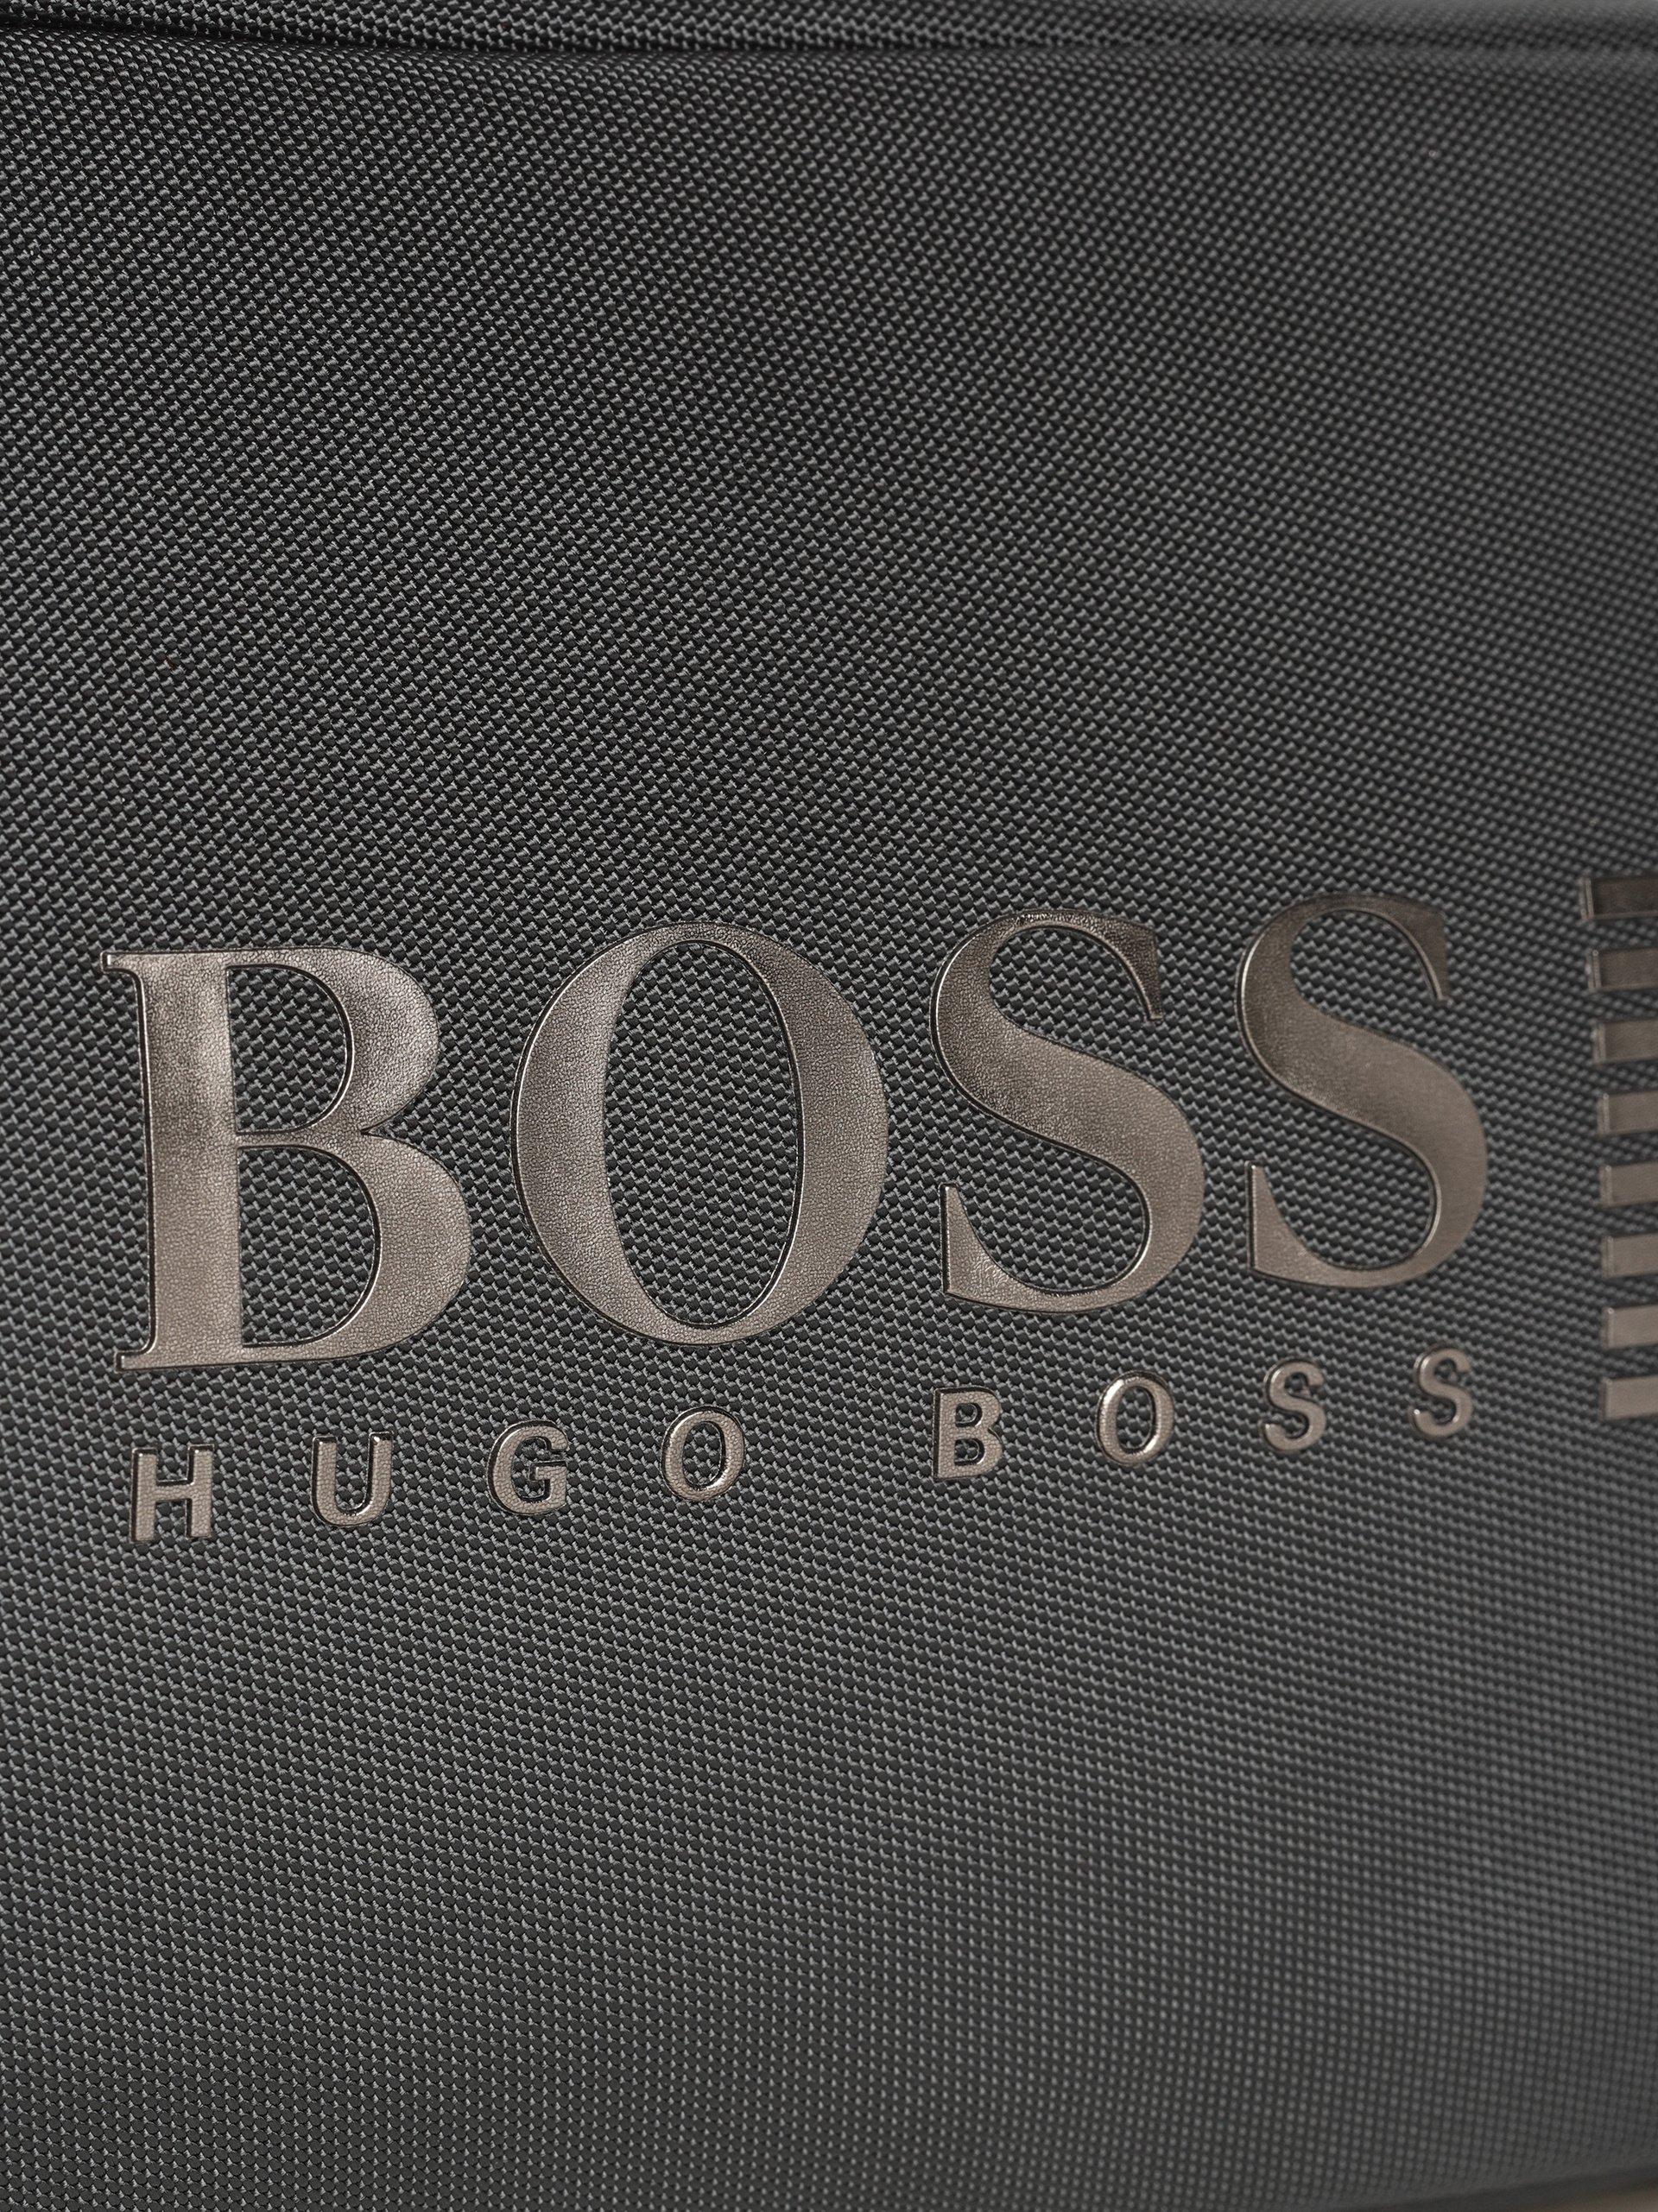 BOSS Herren Kulturtasche - Pixel ML_Washbag